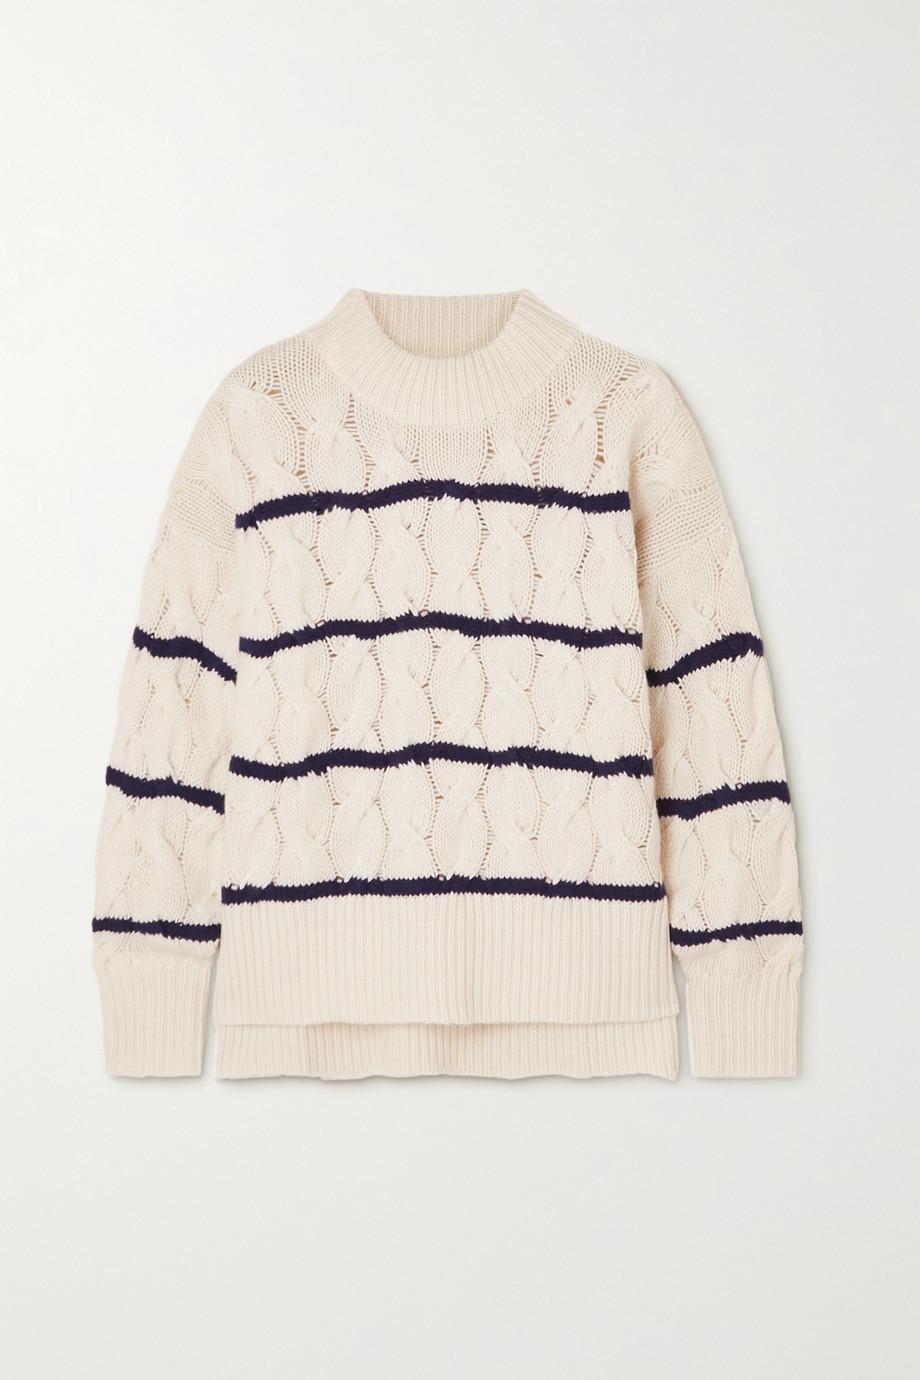 APIECE APART La Vid striped cable-knit cashmere sweater